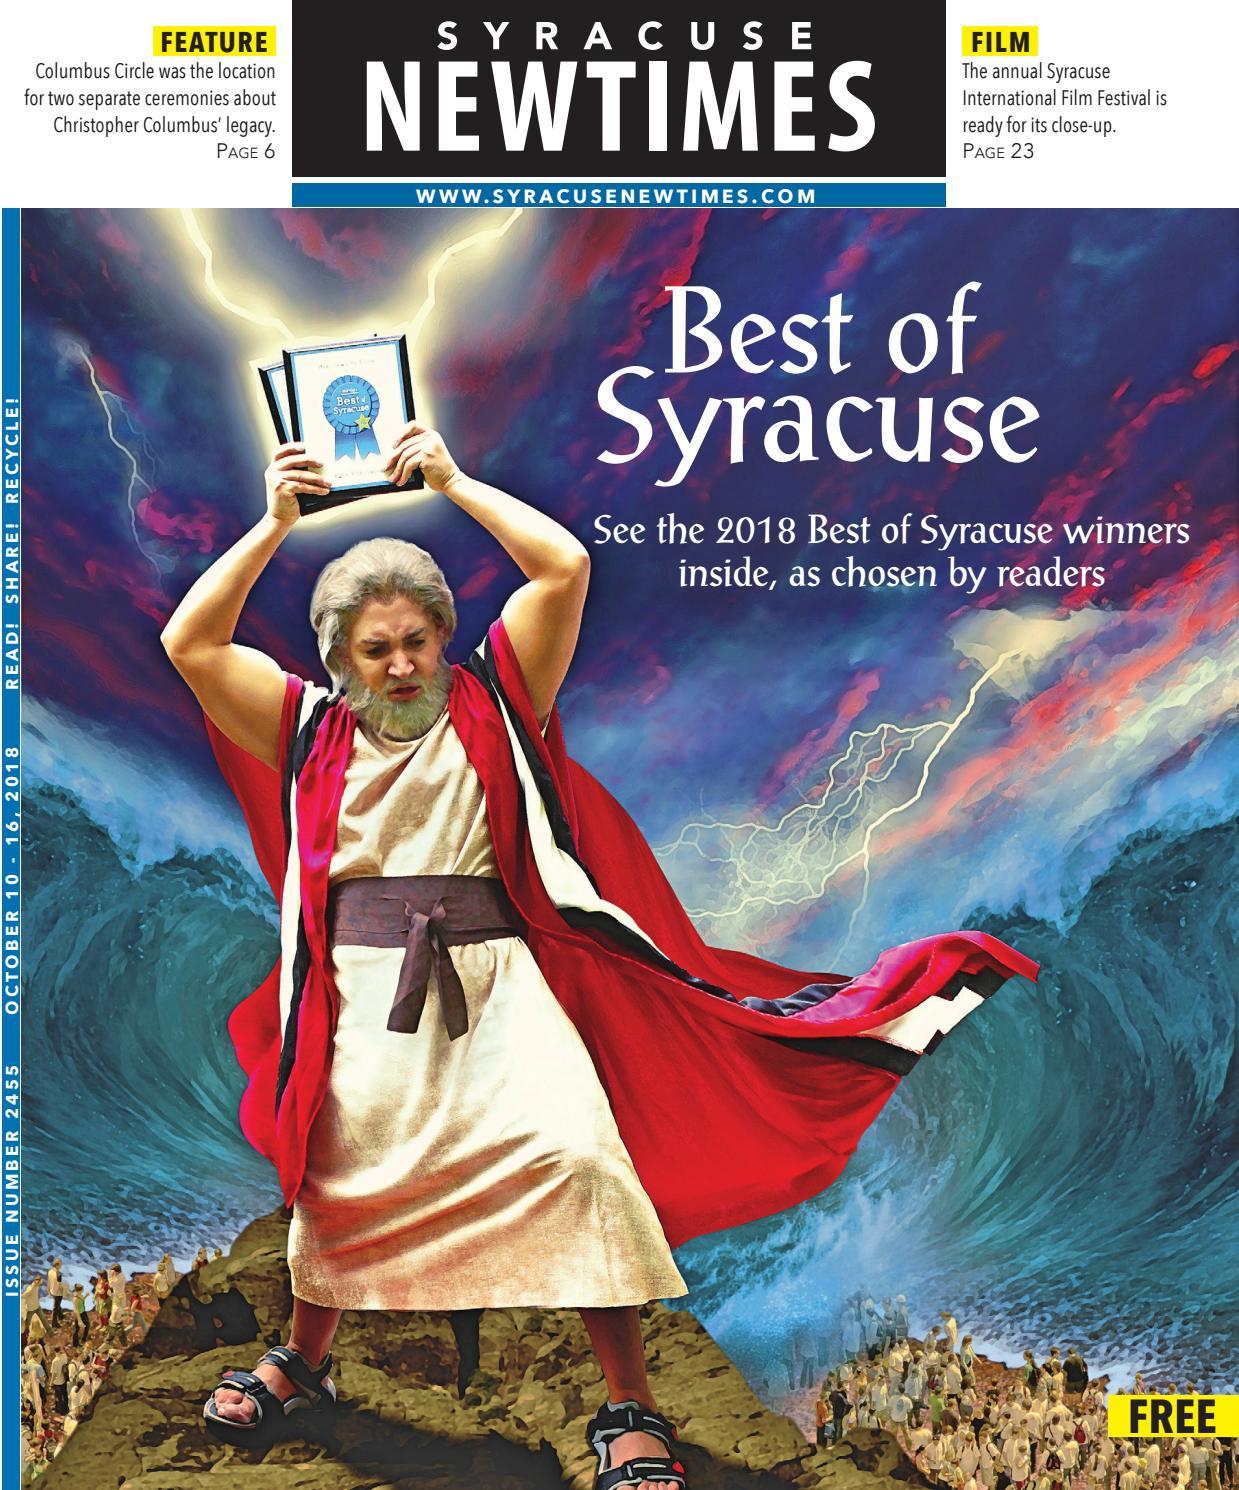 Syracuse New Times 10-10-18